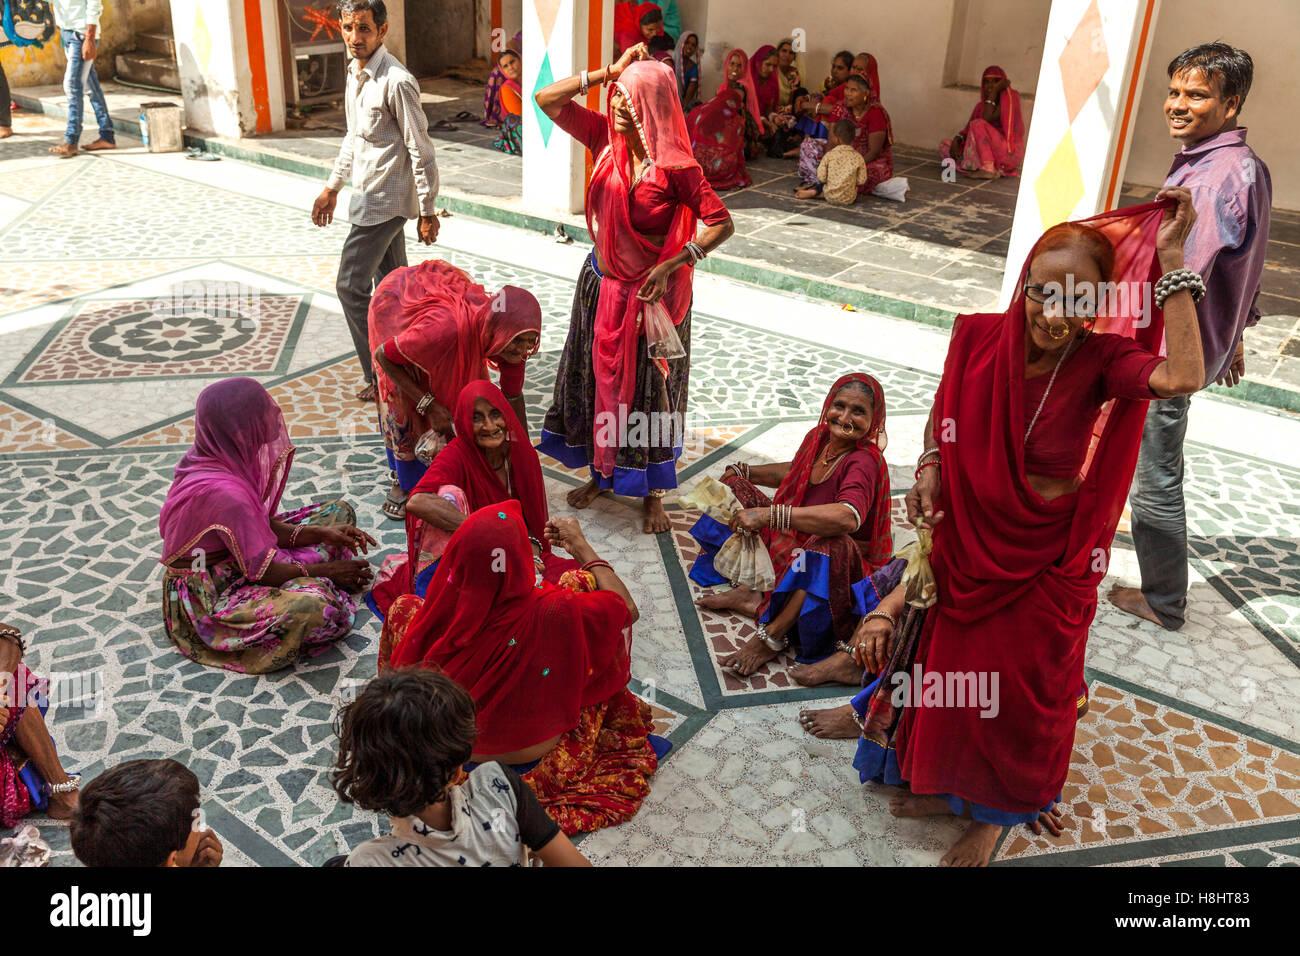 Rajasthani woman sitting - Stock Image